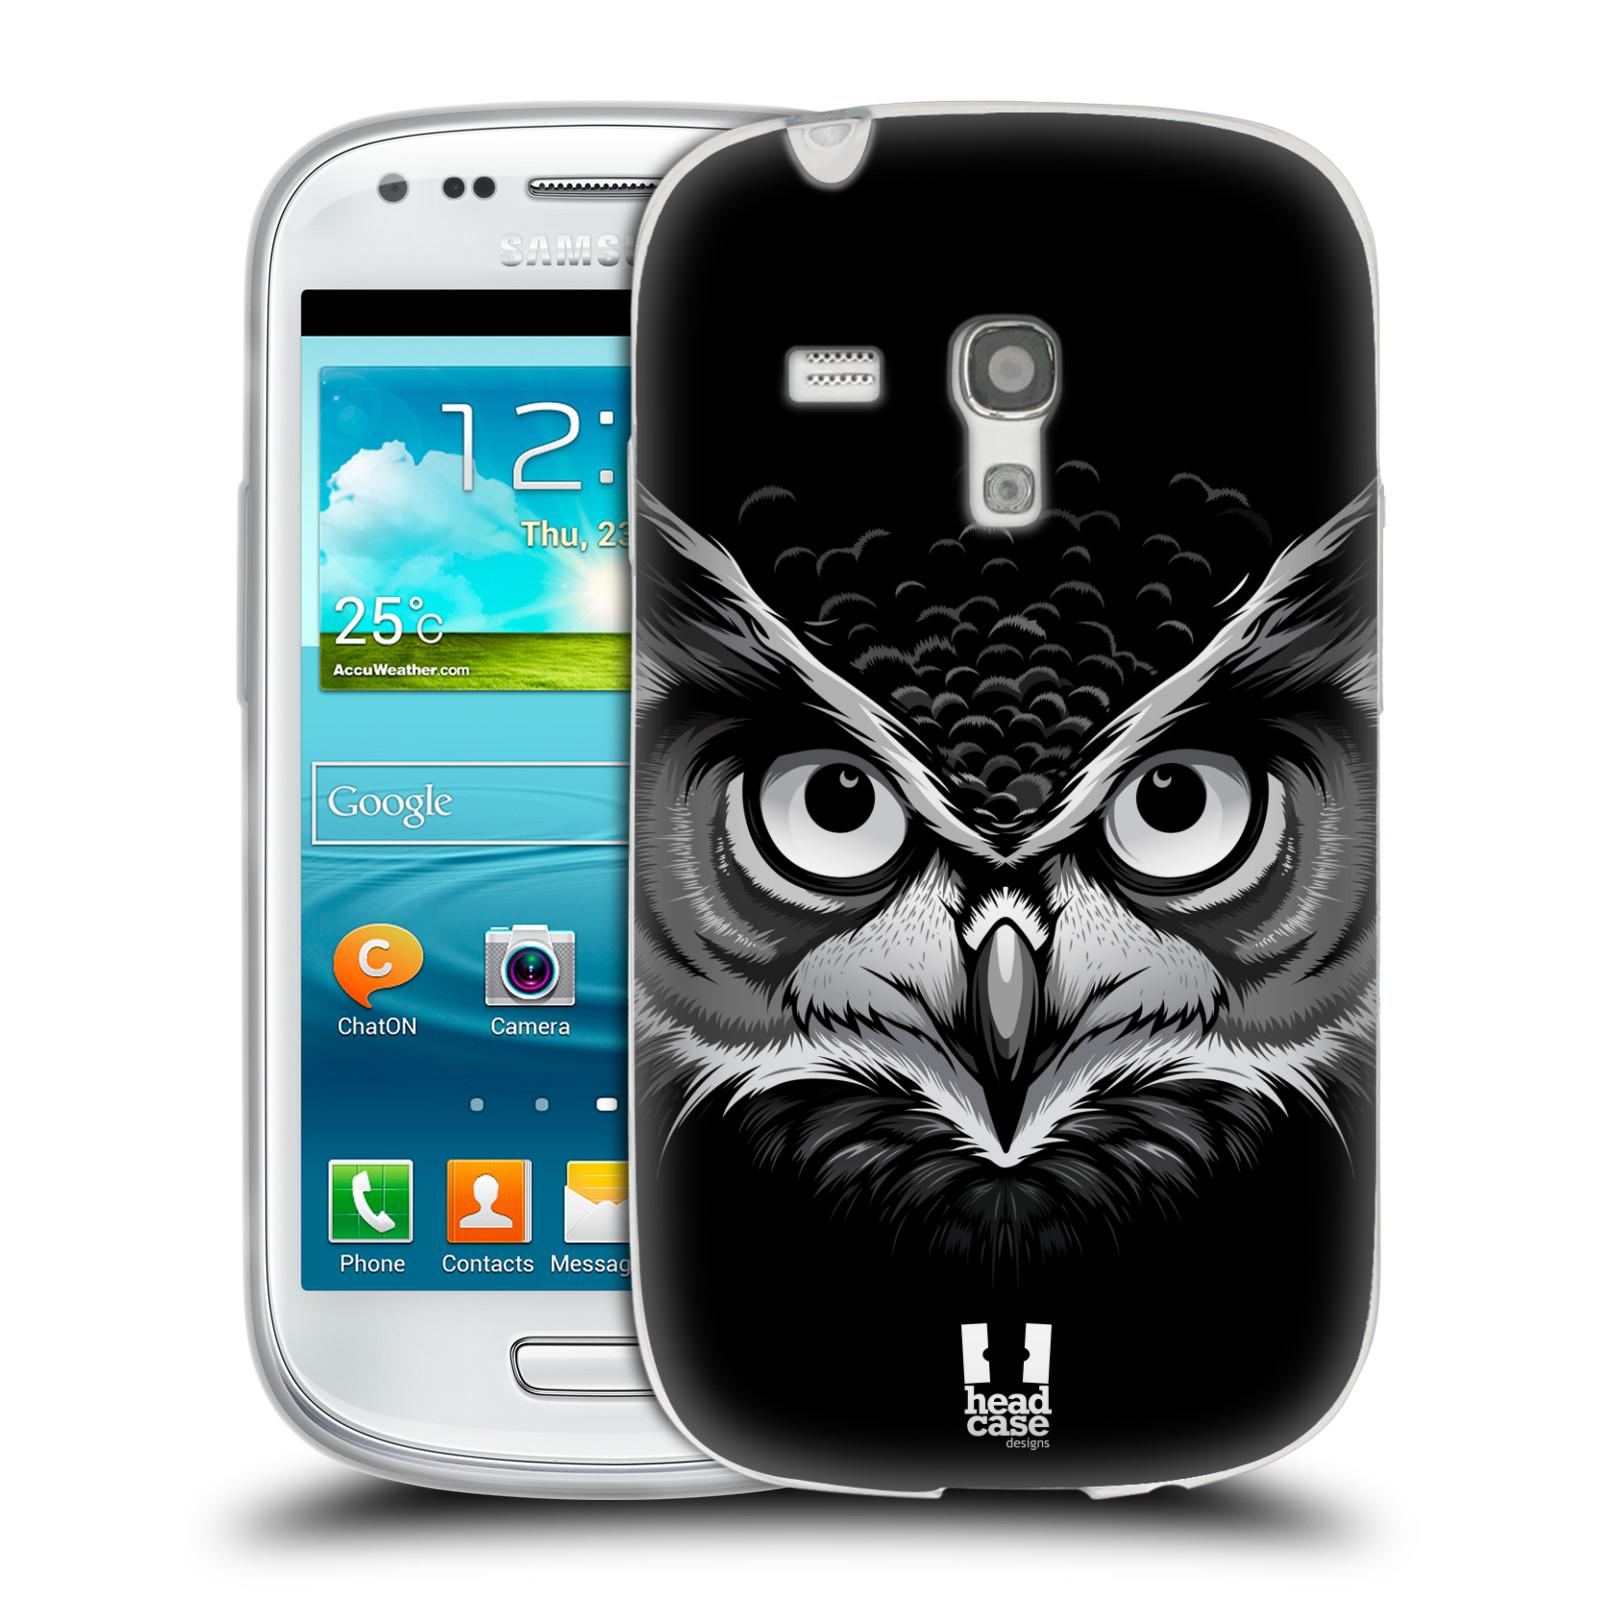 HEAD CASE silikonový obal na mobil Samsung Galaxy S3 MINI i8190 vzor Zvíře kreslená tvář 2 sova